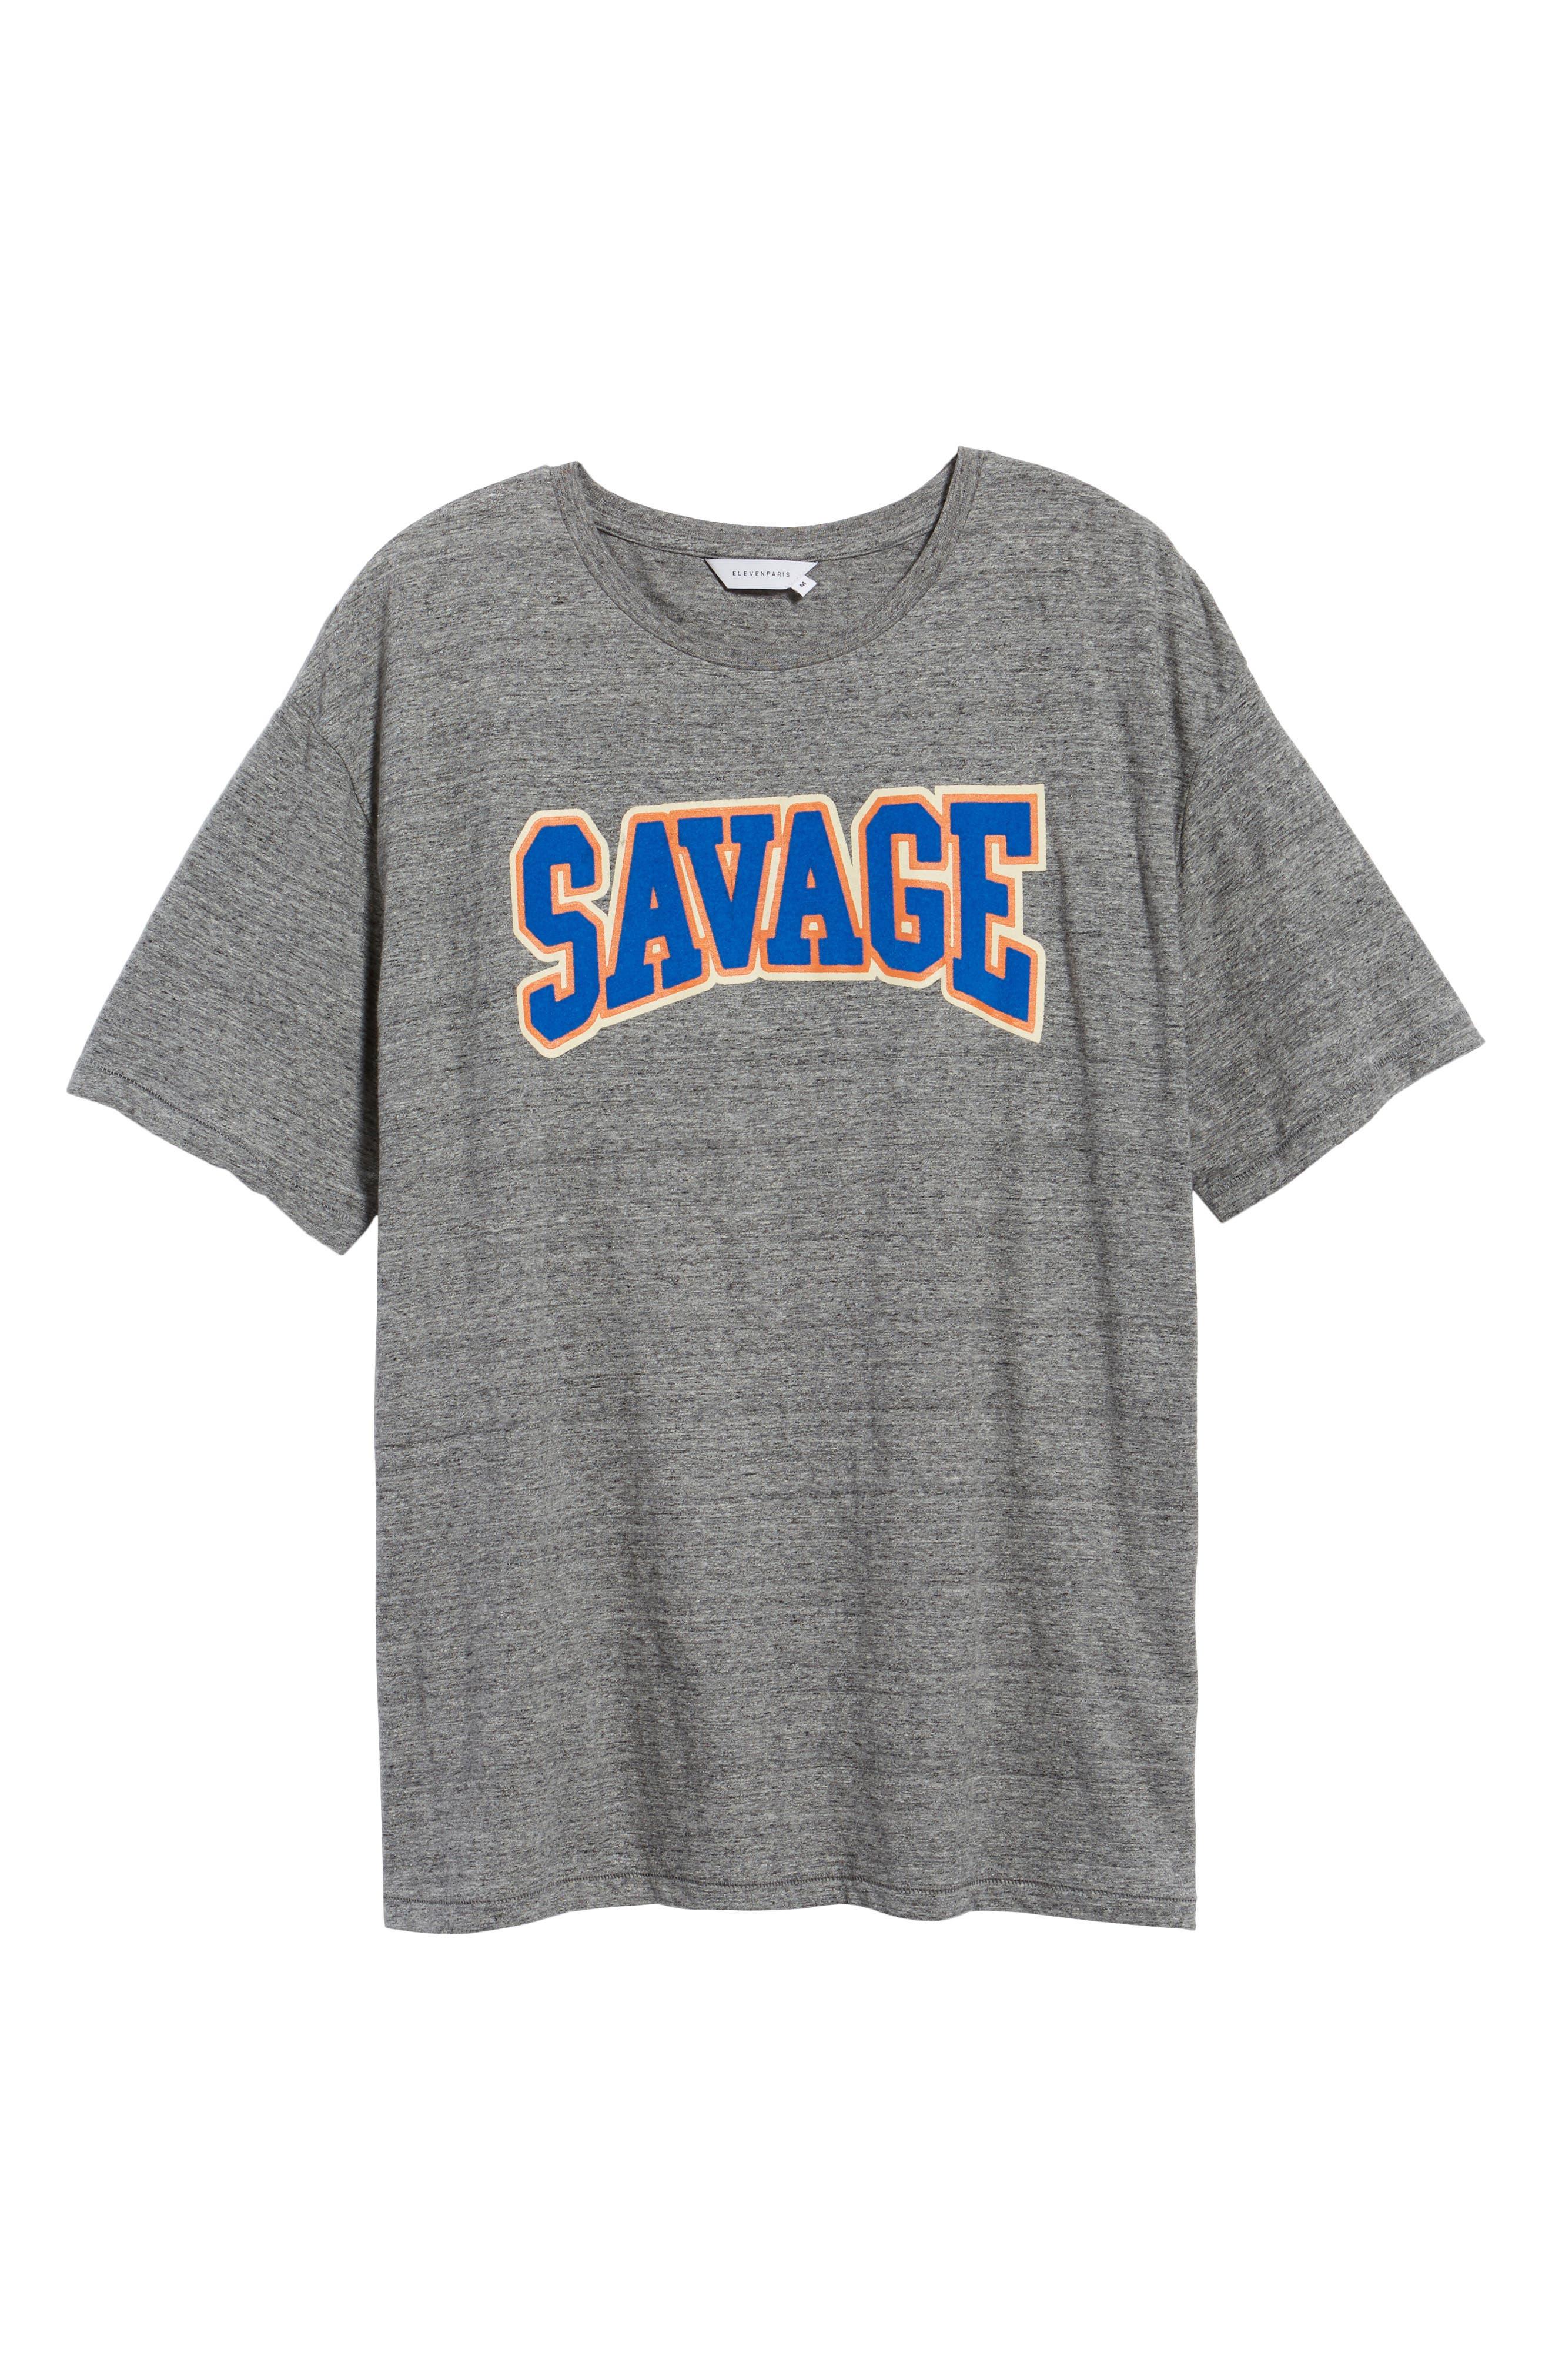 Savage T-Shirt,                             Alternate thumbnail 6, color,                             Grunder Grey